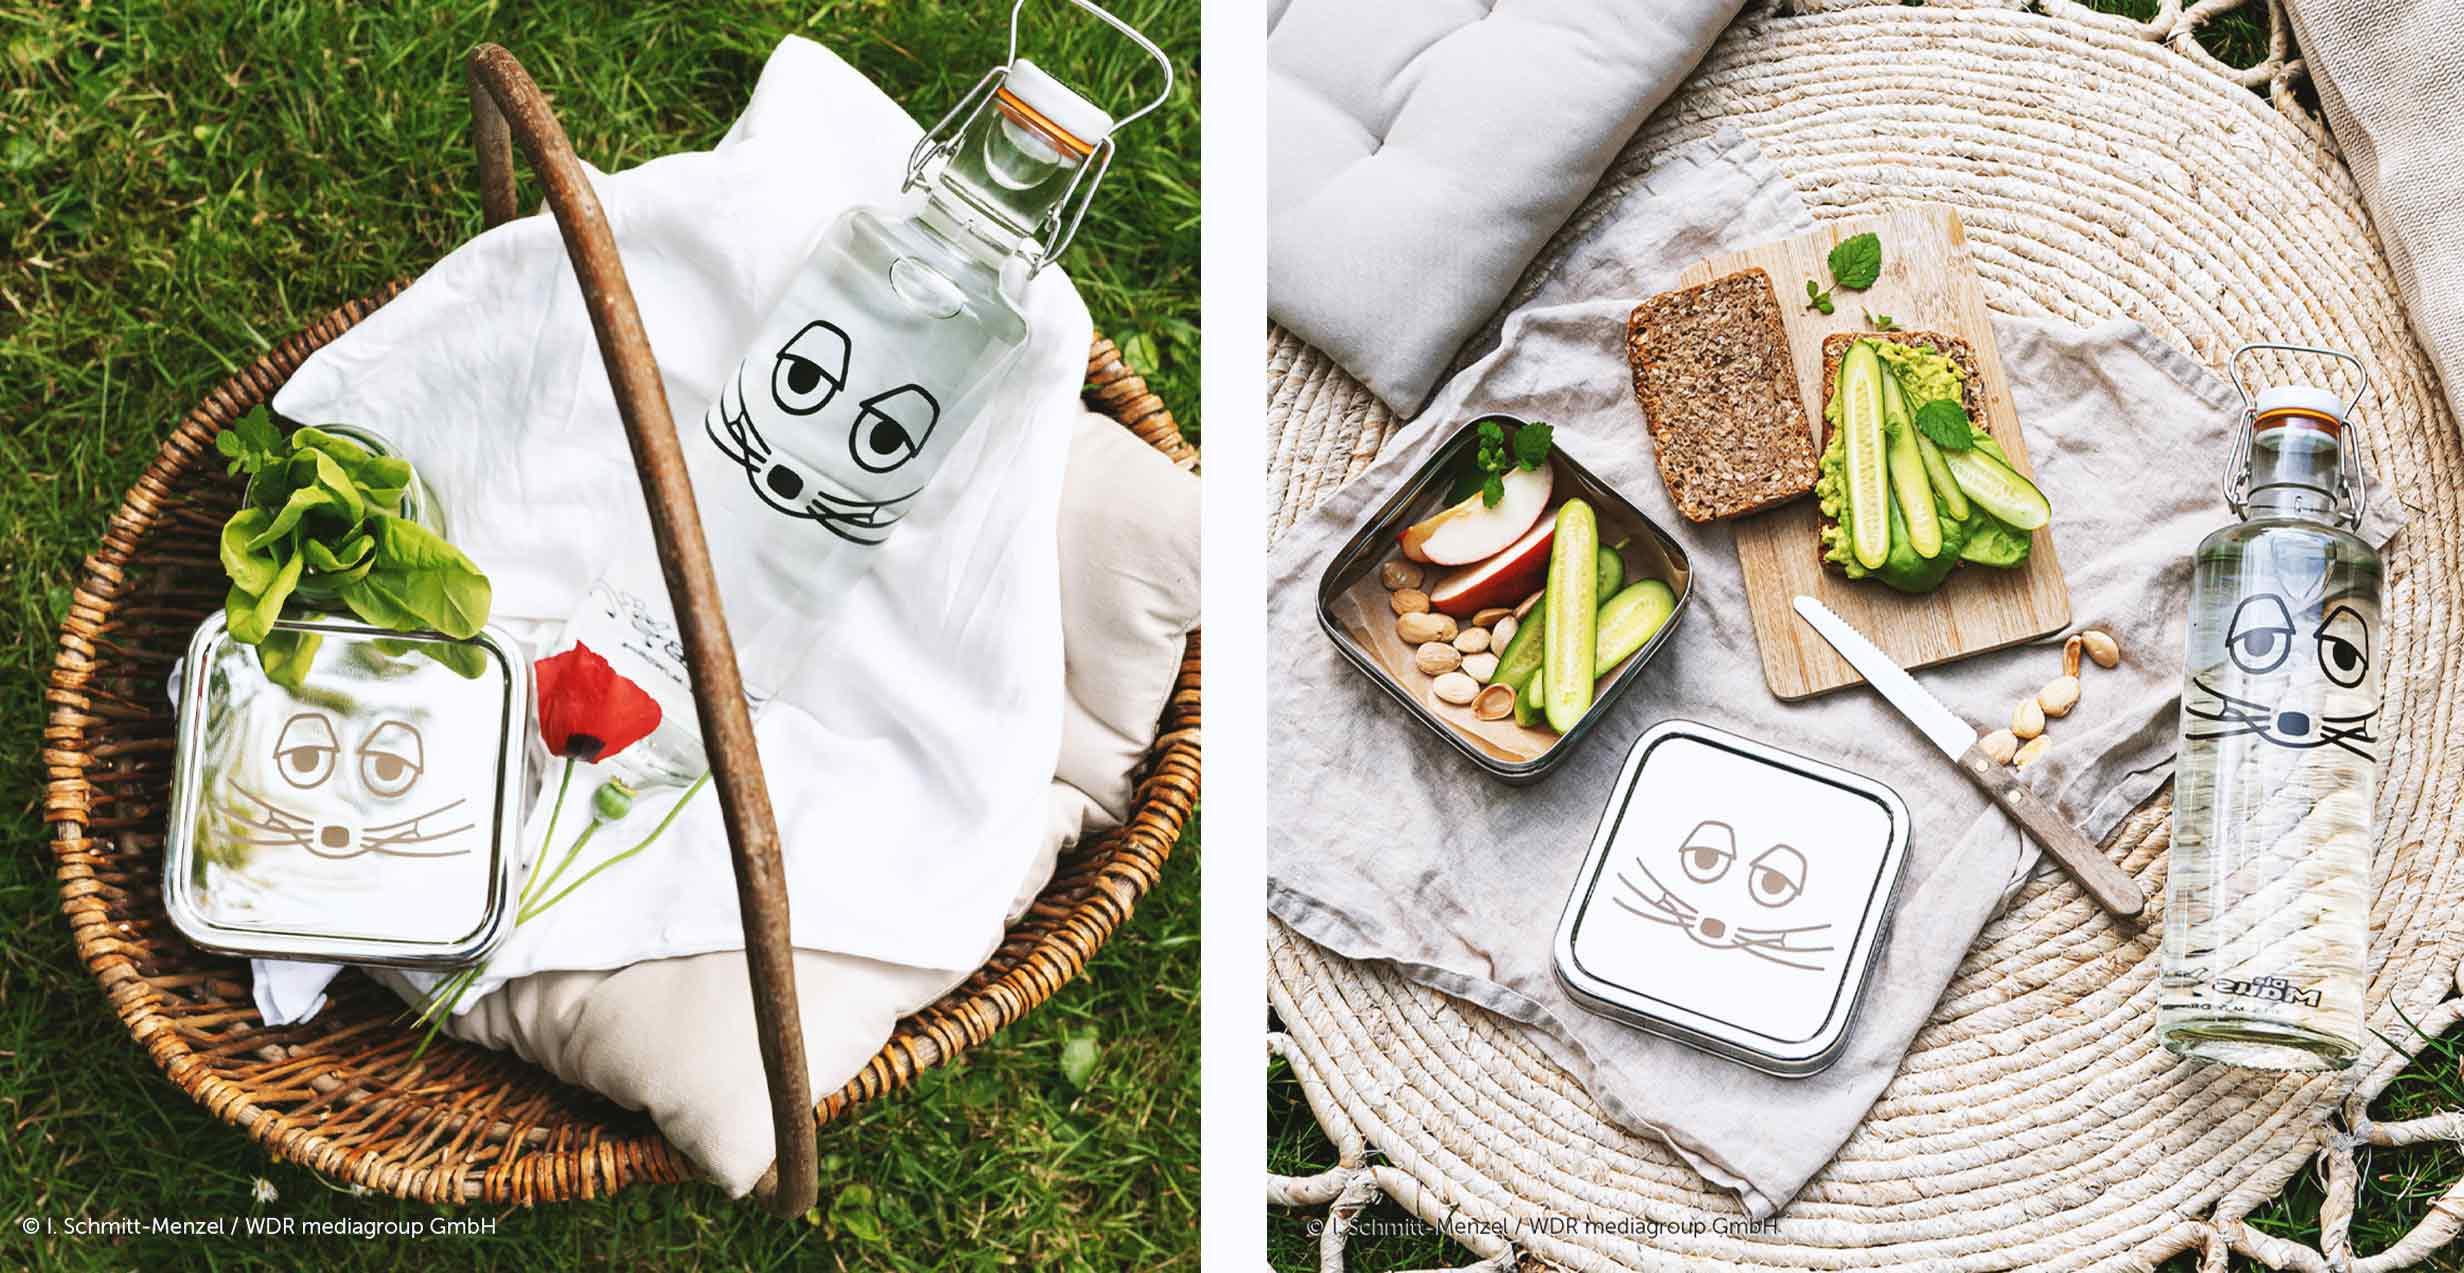 maus-brotdose-Trinkflasche-Glasflasche-maus-soulbottles-picknick